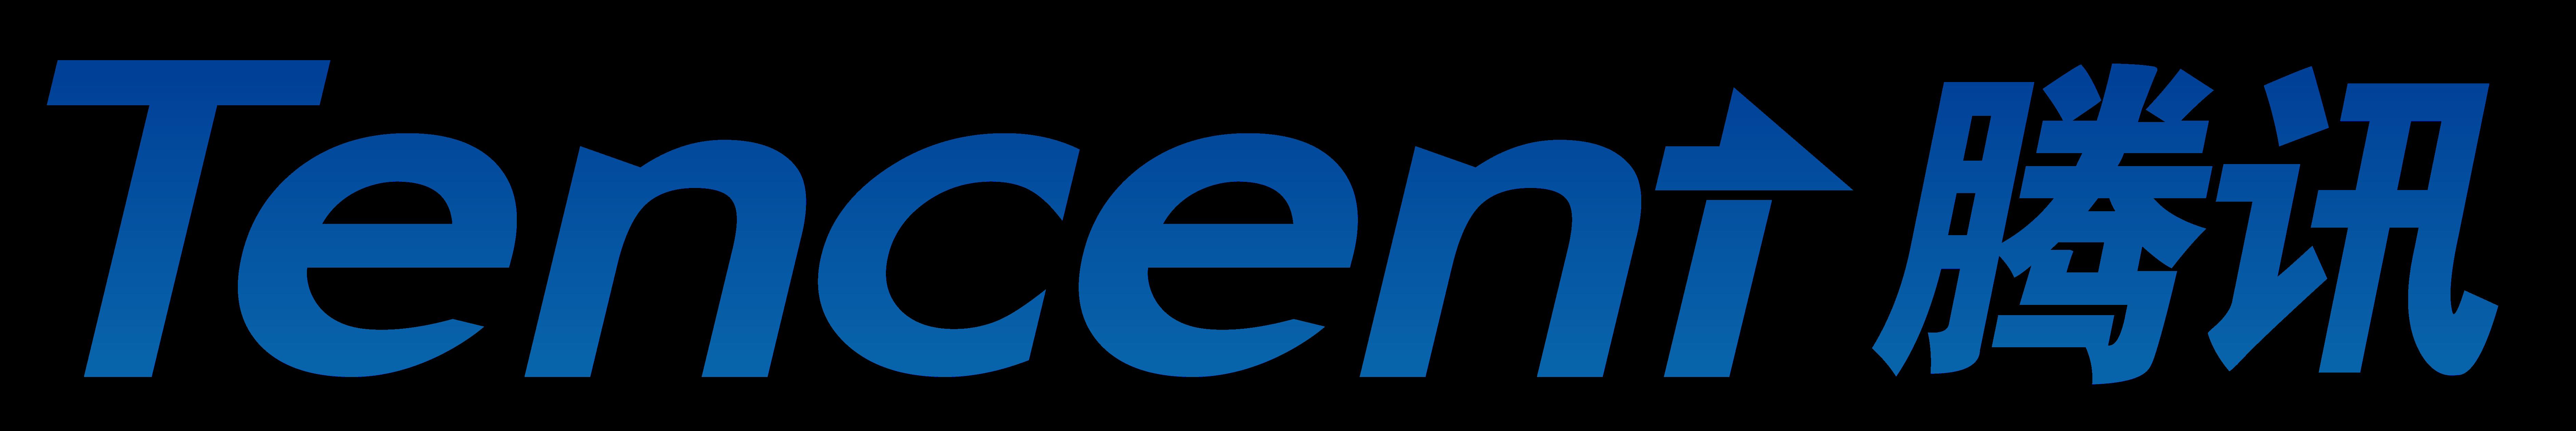 Silver-Level Sponsor